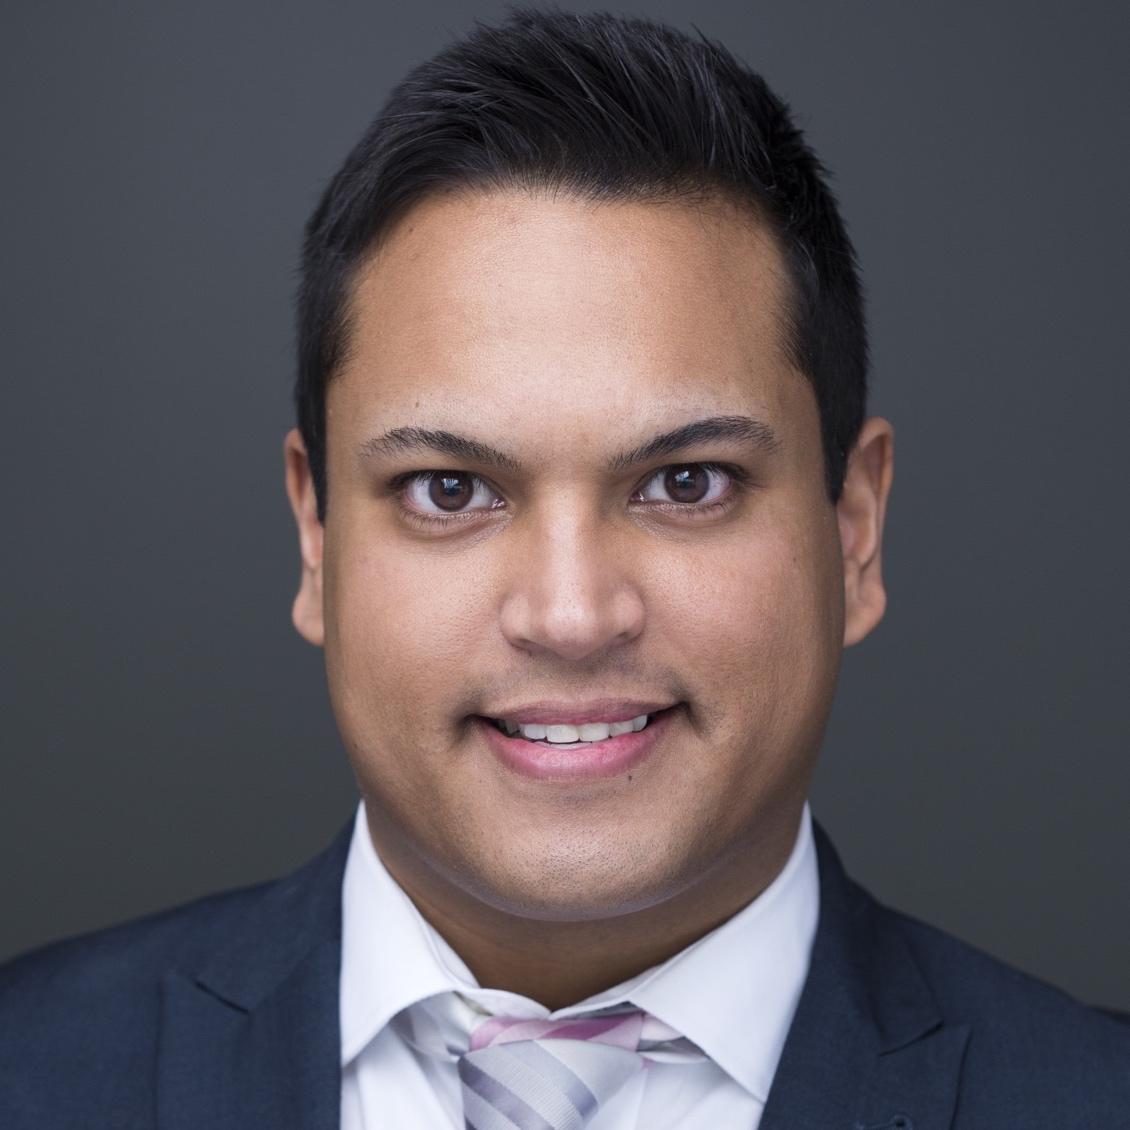 <hr></hr>Bryan Sachdeva <br>Vice President, Executive Sponsor for LGBTQ2IA+ Affinity Group <br>CGI